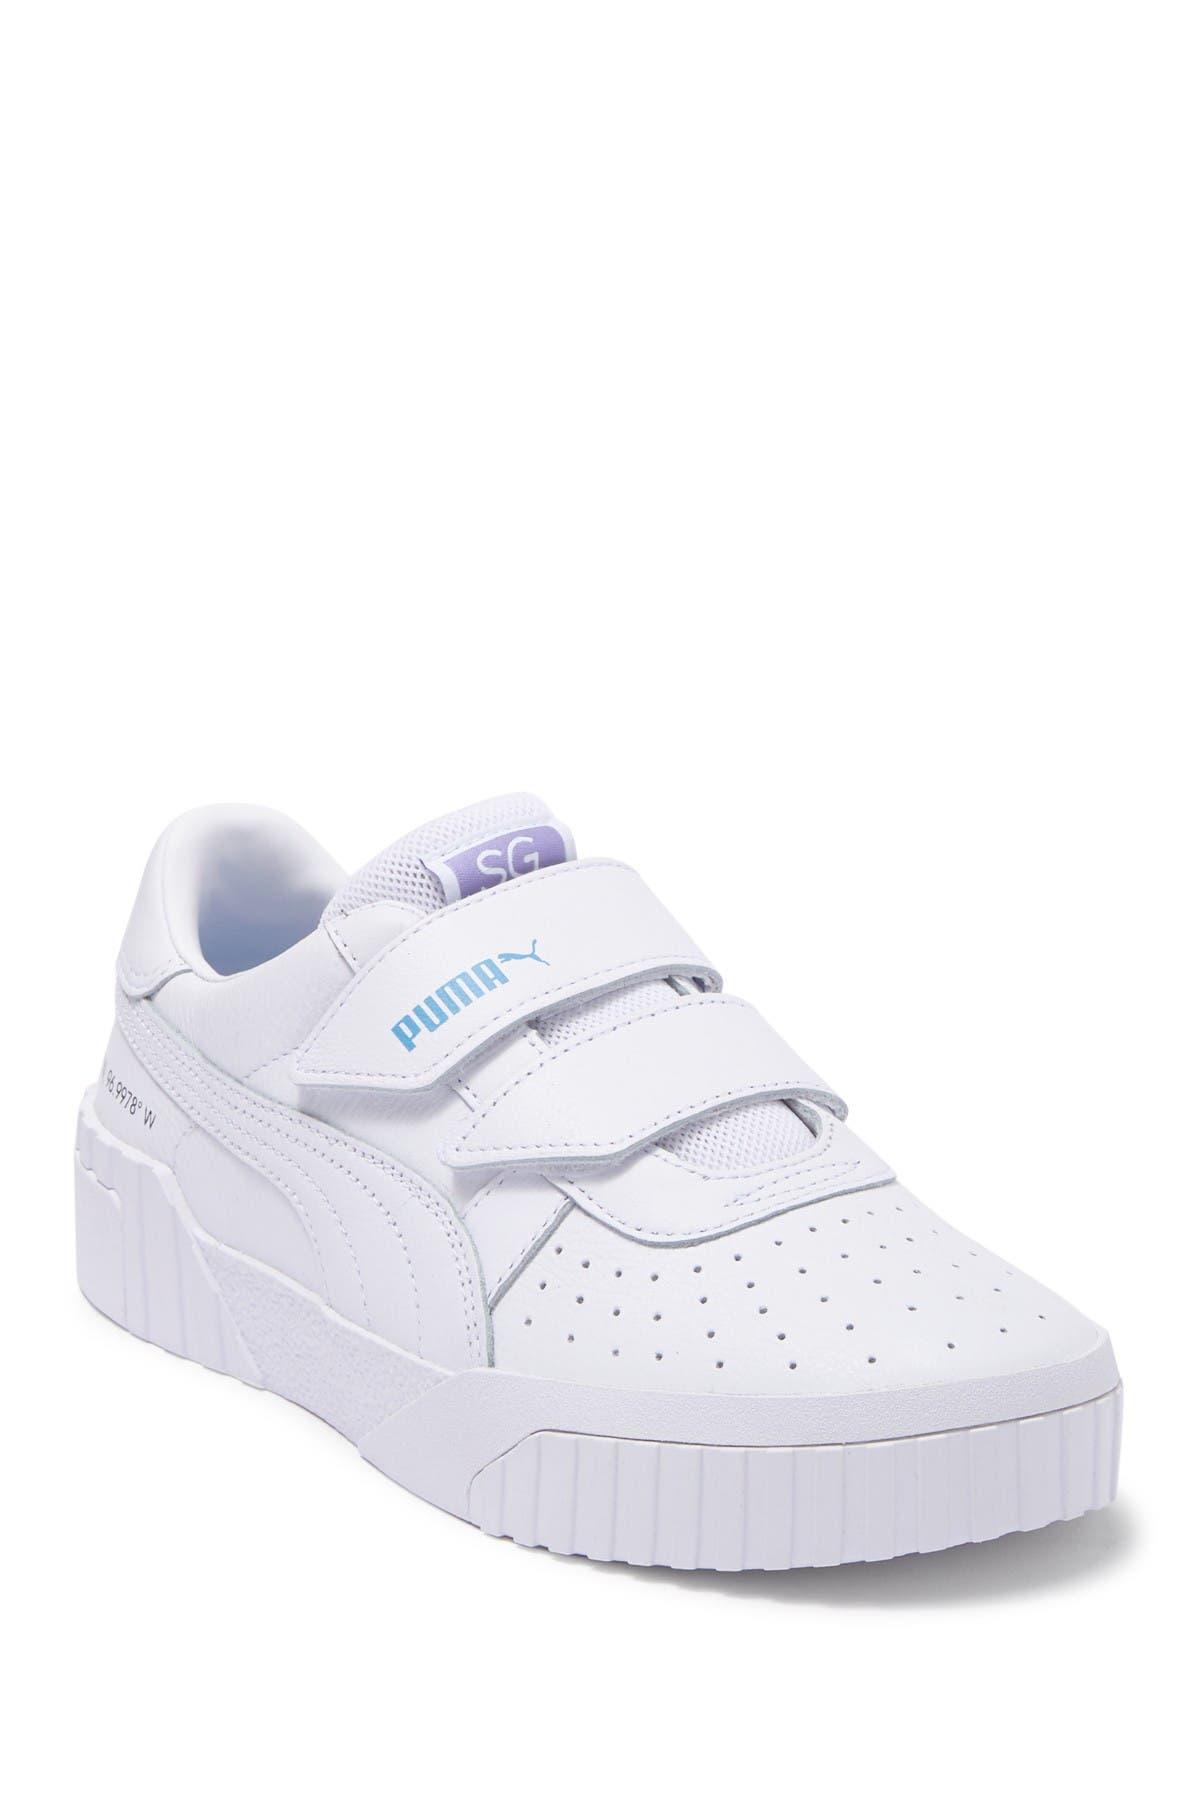 PUMA | Cali X SG Sneaker | Nordstrom Rack